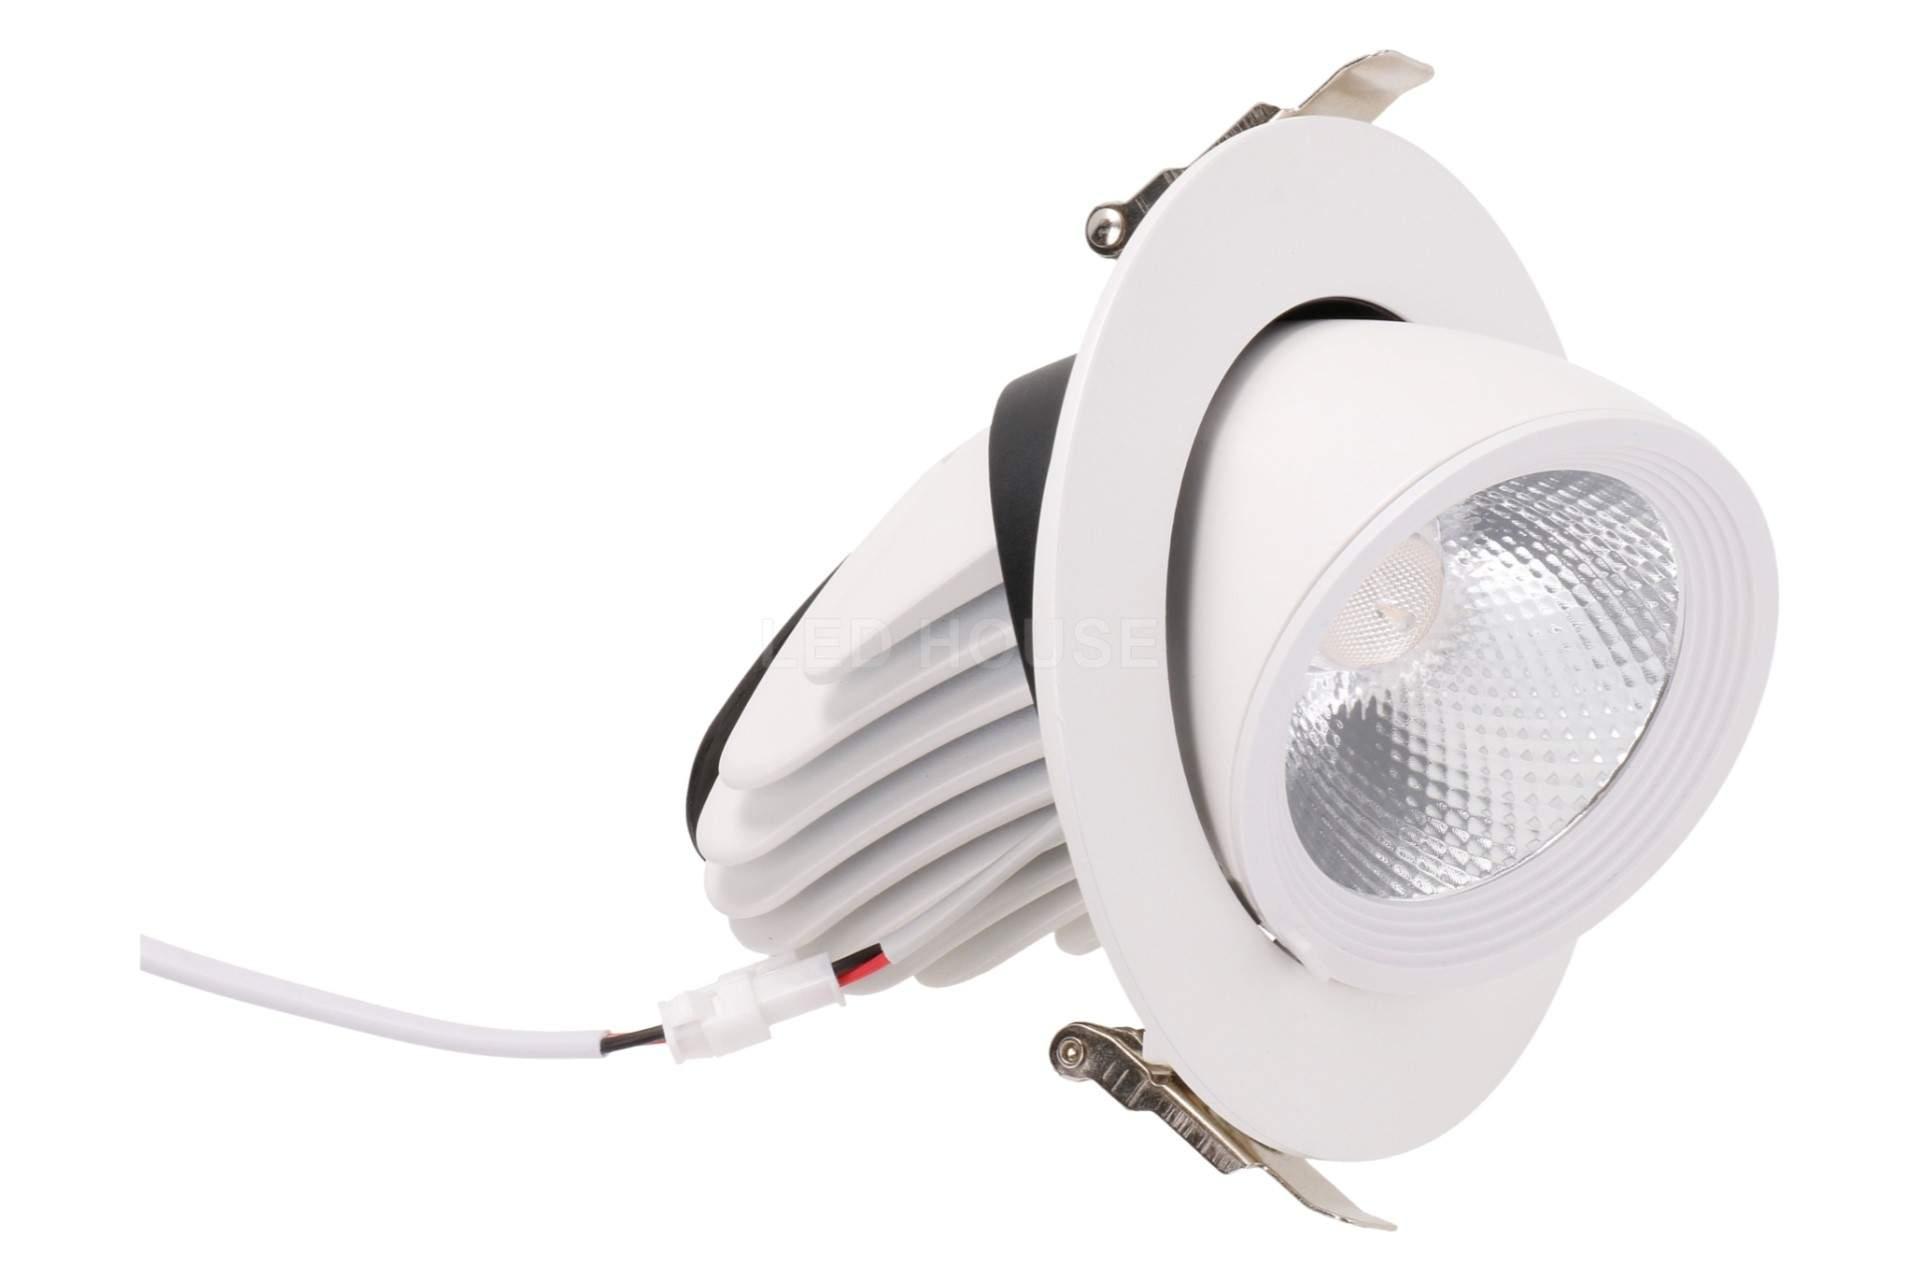 LED downlight LED downlight REVAL BULB Gimbal COB DIM white  5W 450lm CRI80  30° IP20 3000K warm white